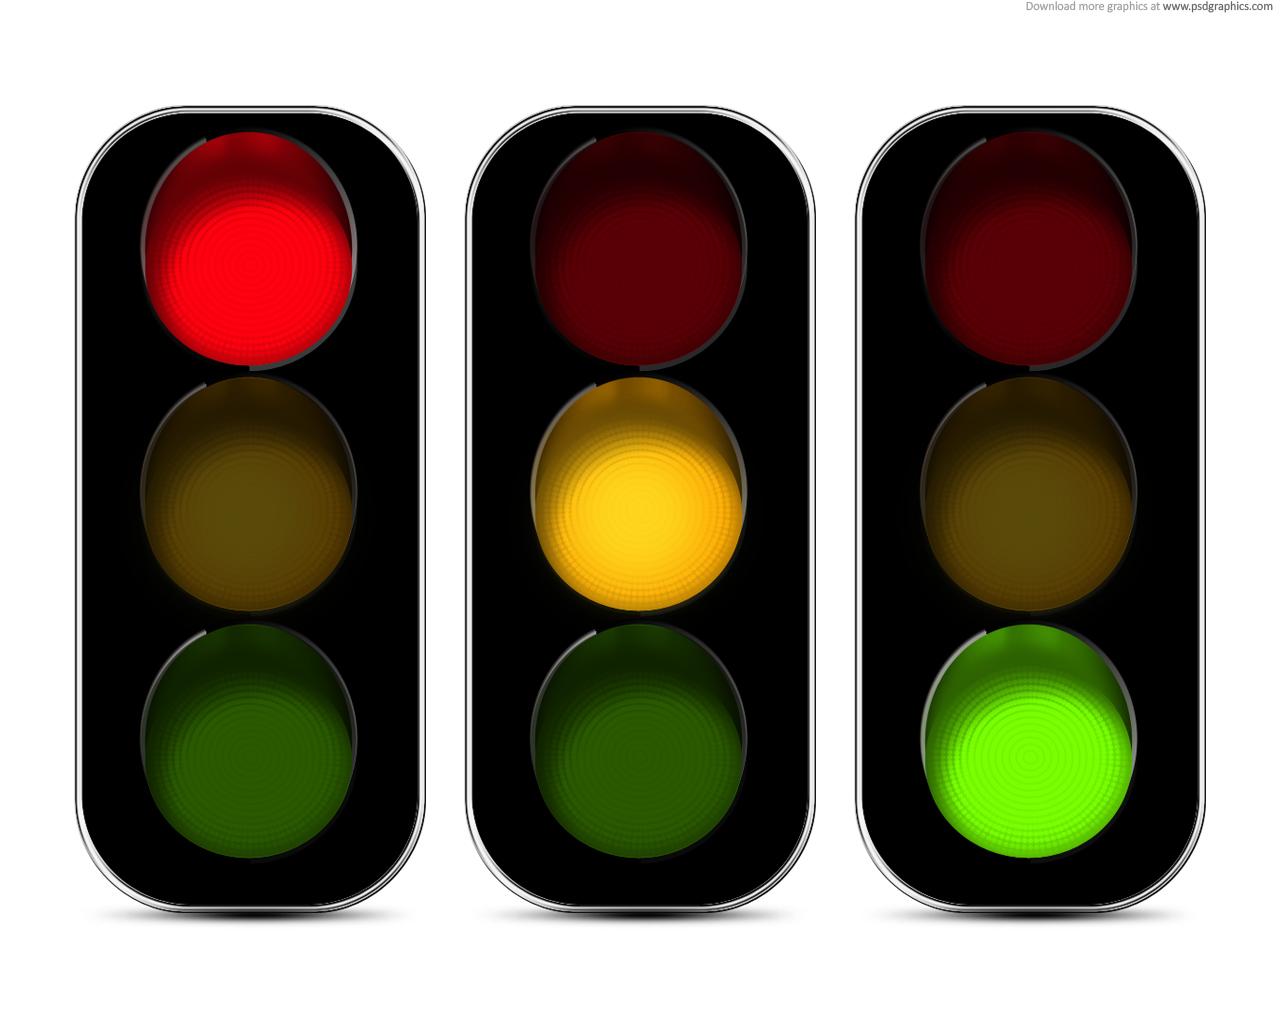 Green Traffic Light Clipart.